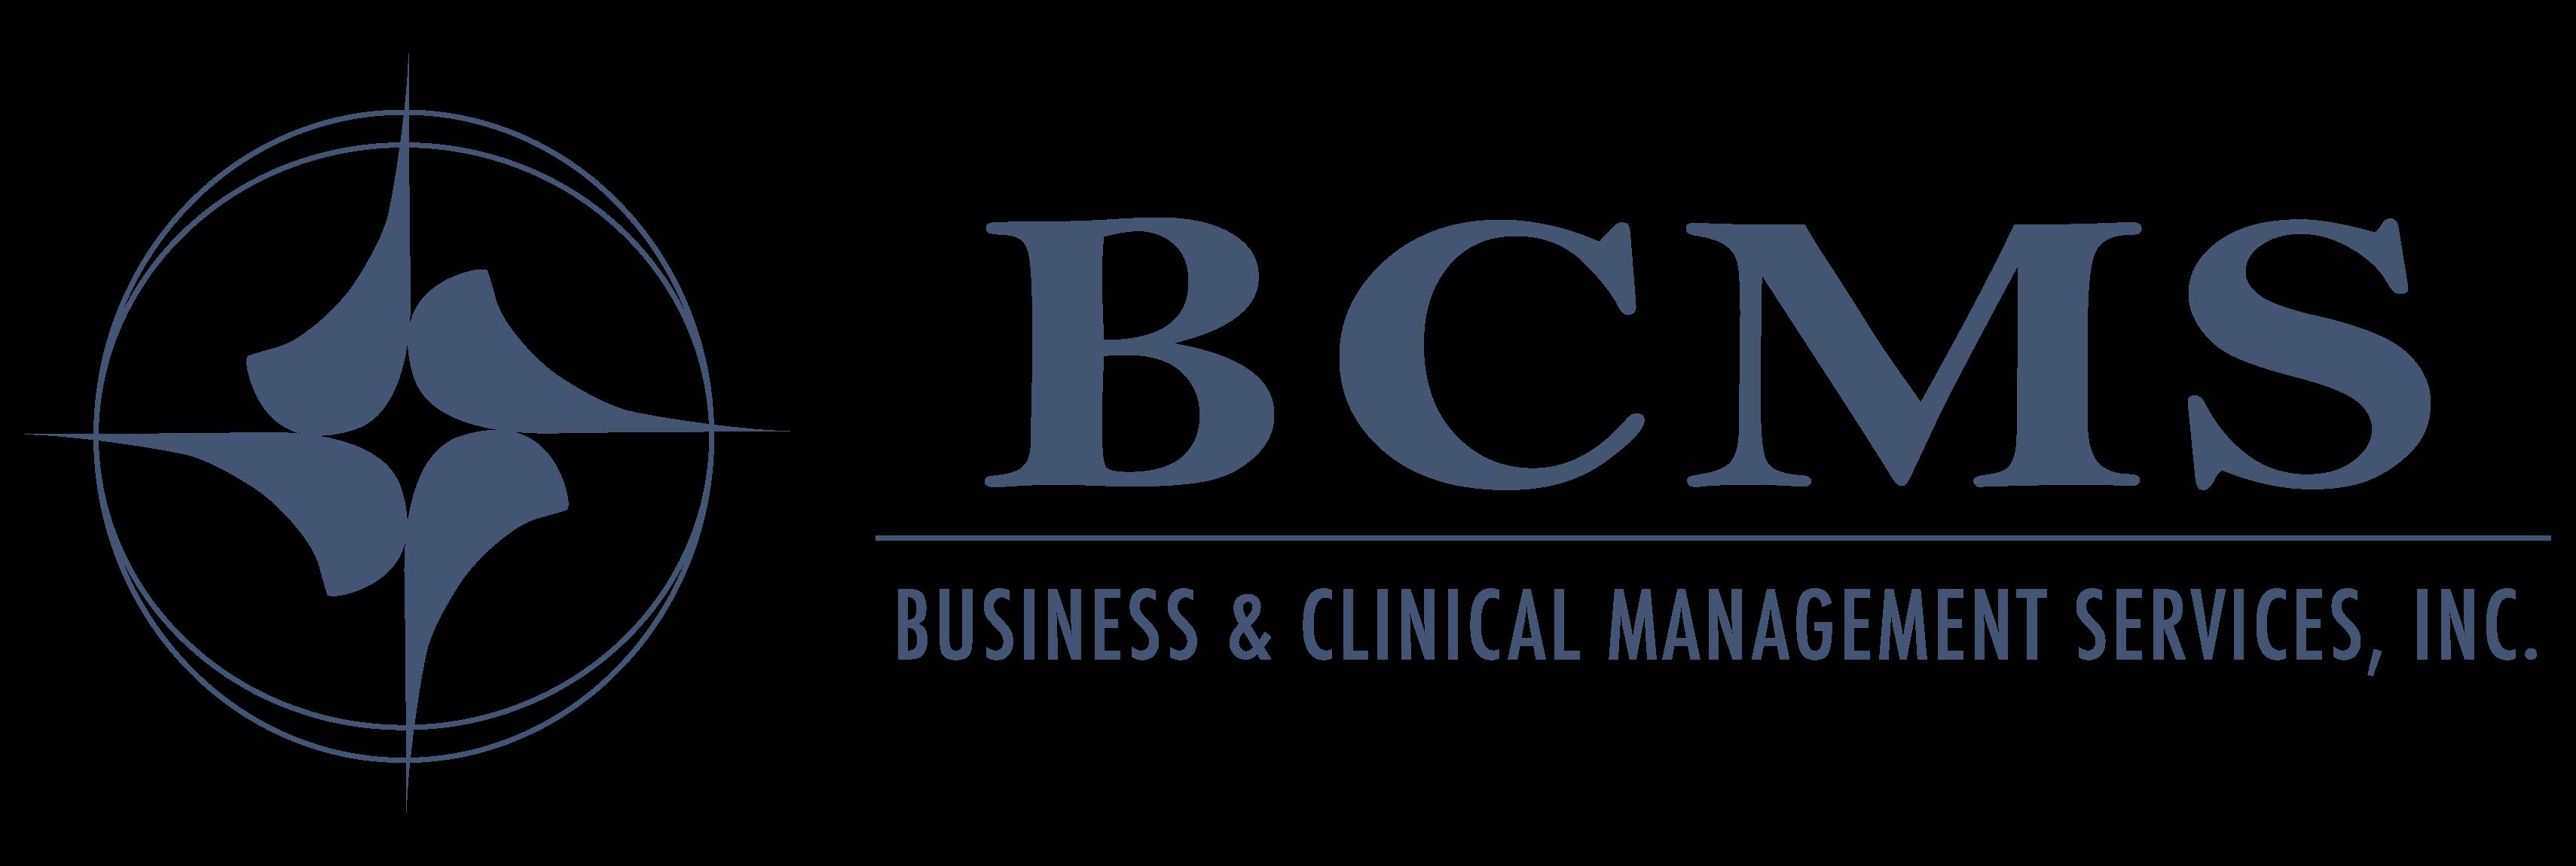 Business & Clinical Management Services, Inc